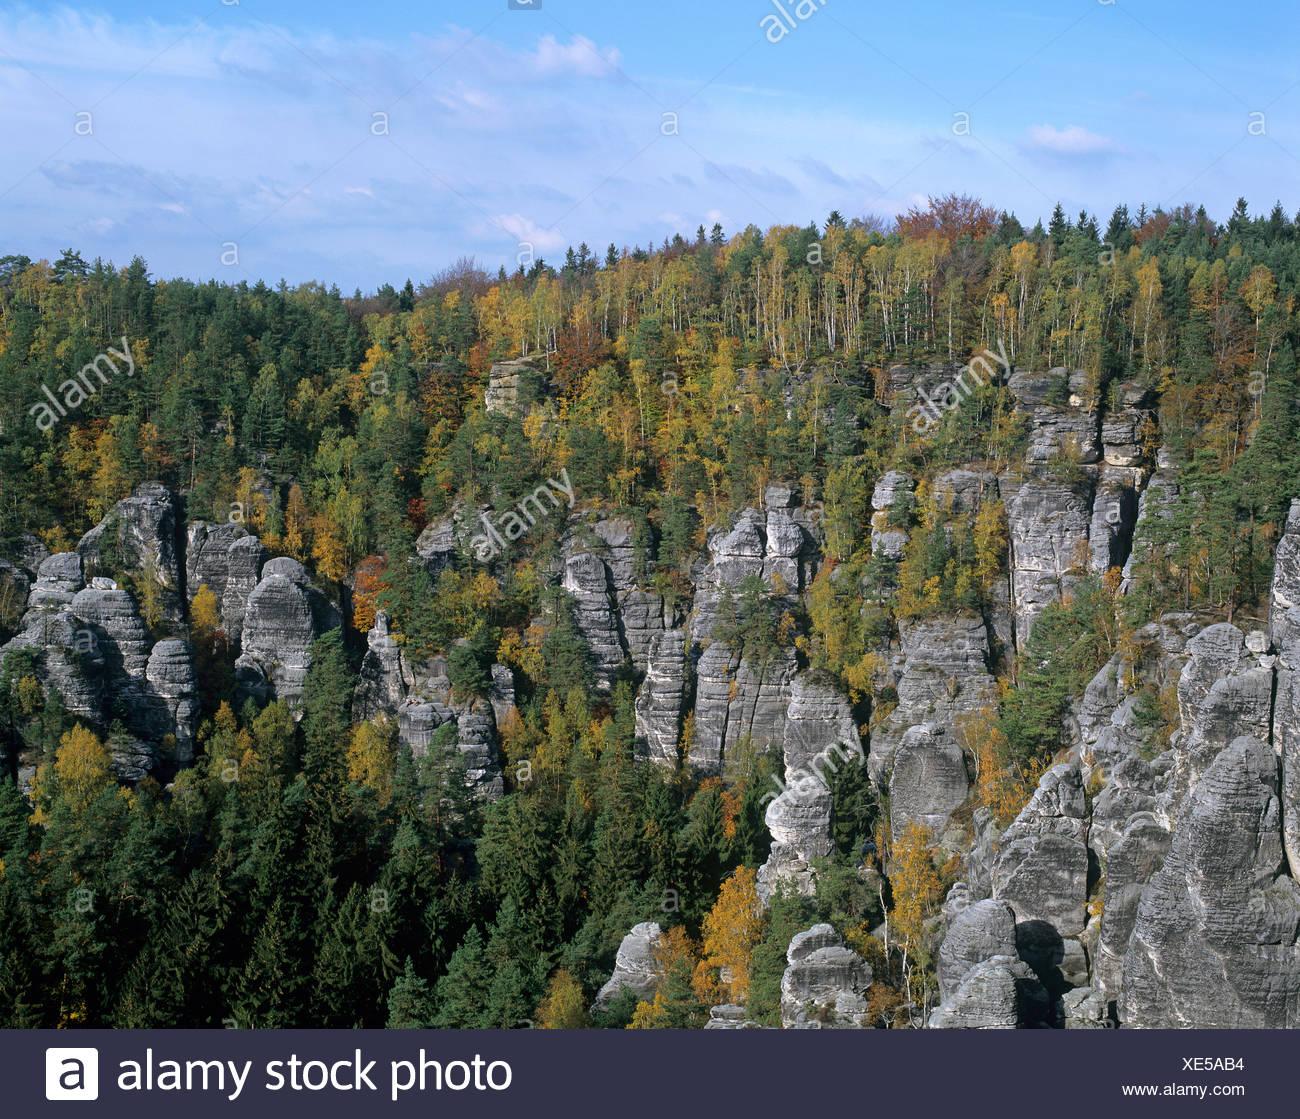 Elbe Sandstone Mountains, Elbsandsteingebirge, Saxon Switzerland National Park, Saxony, Germany, Europe - Stock Image